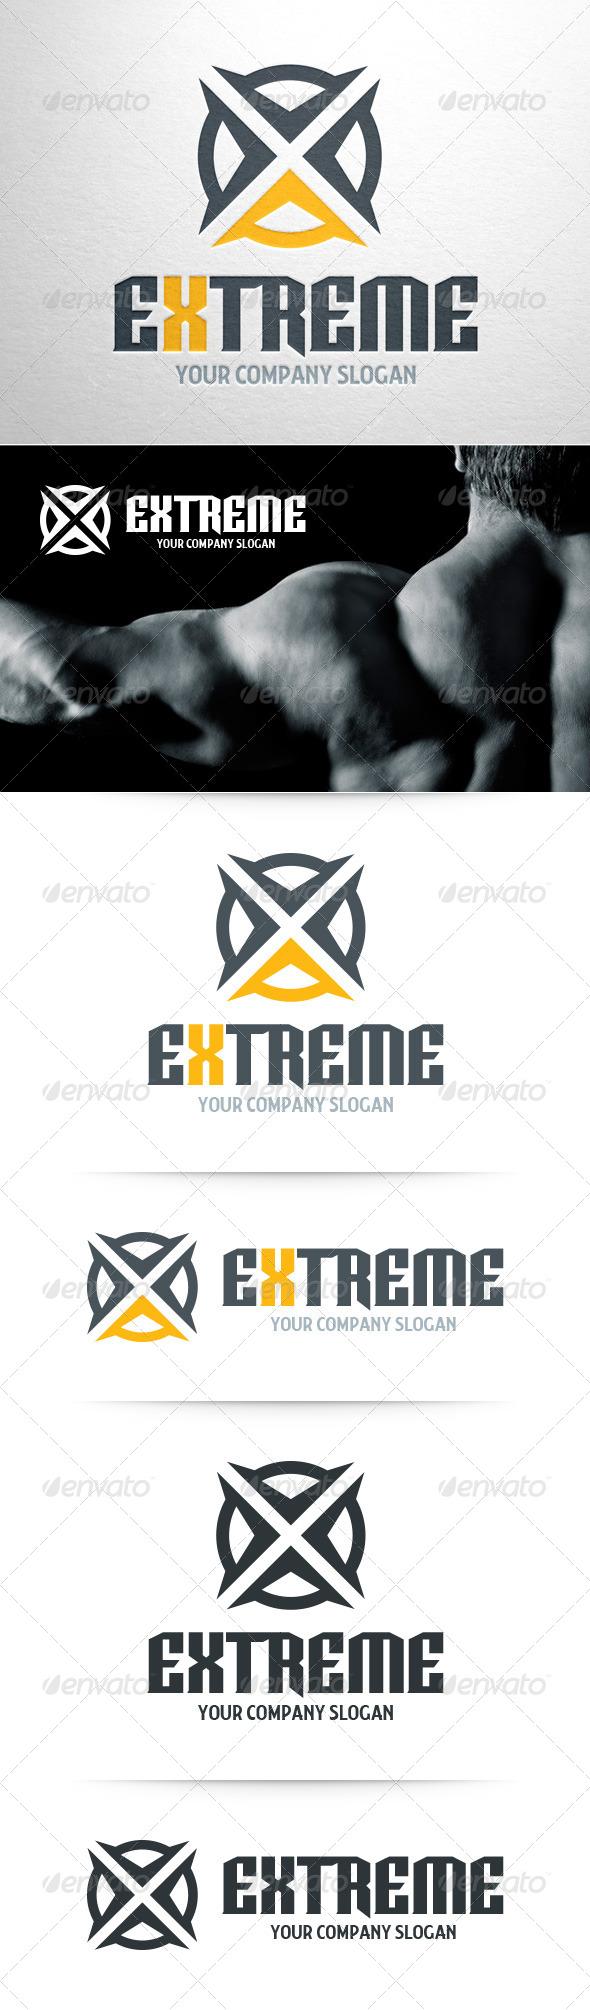 Extreme - Letter X Logo